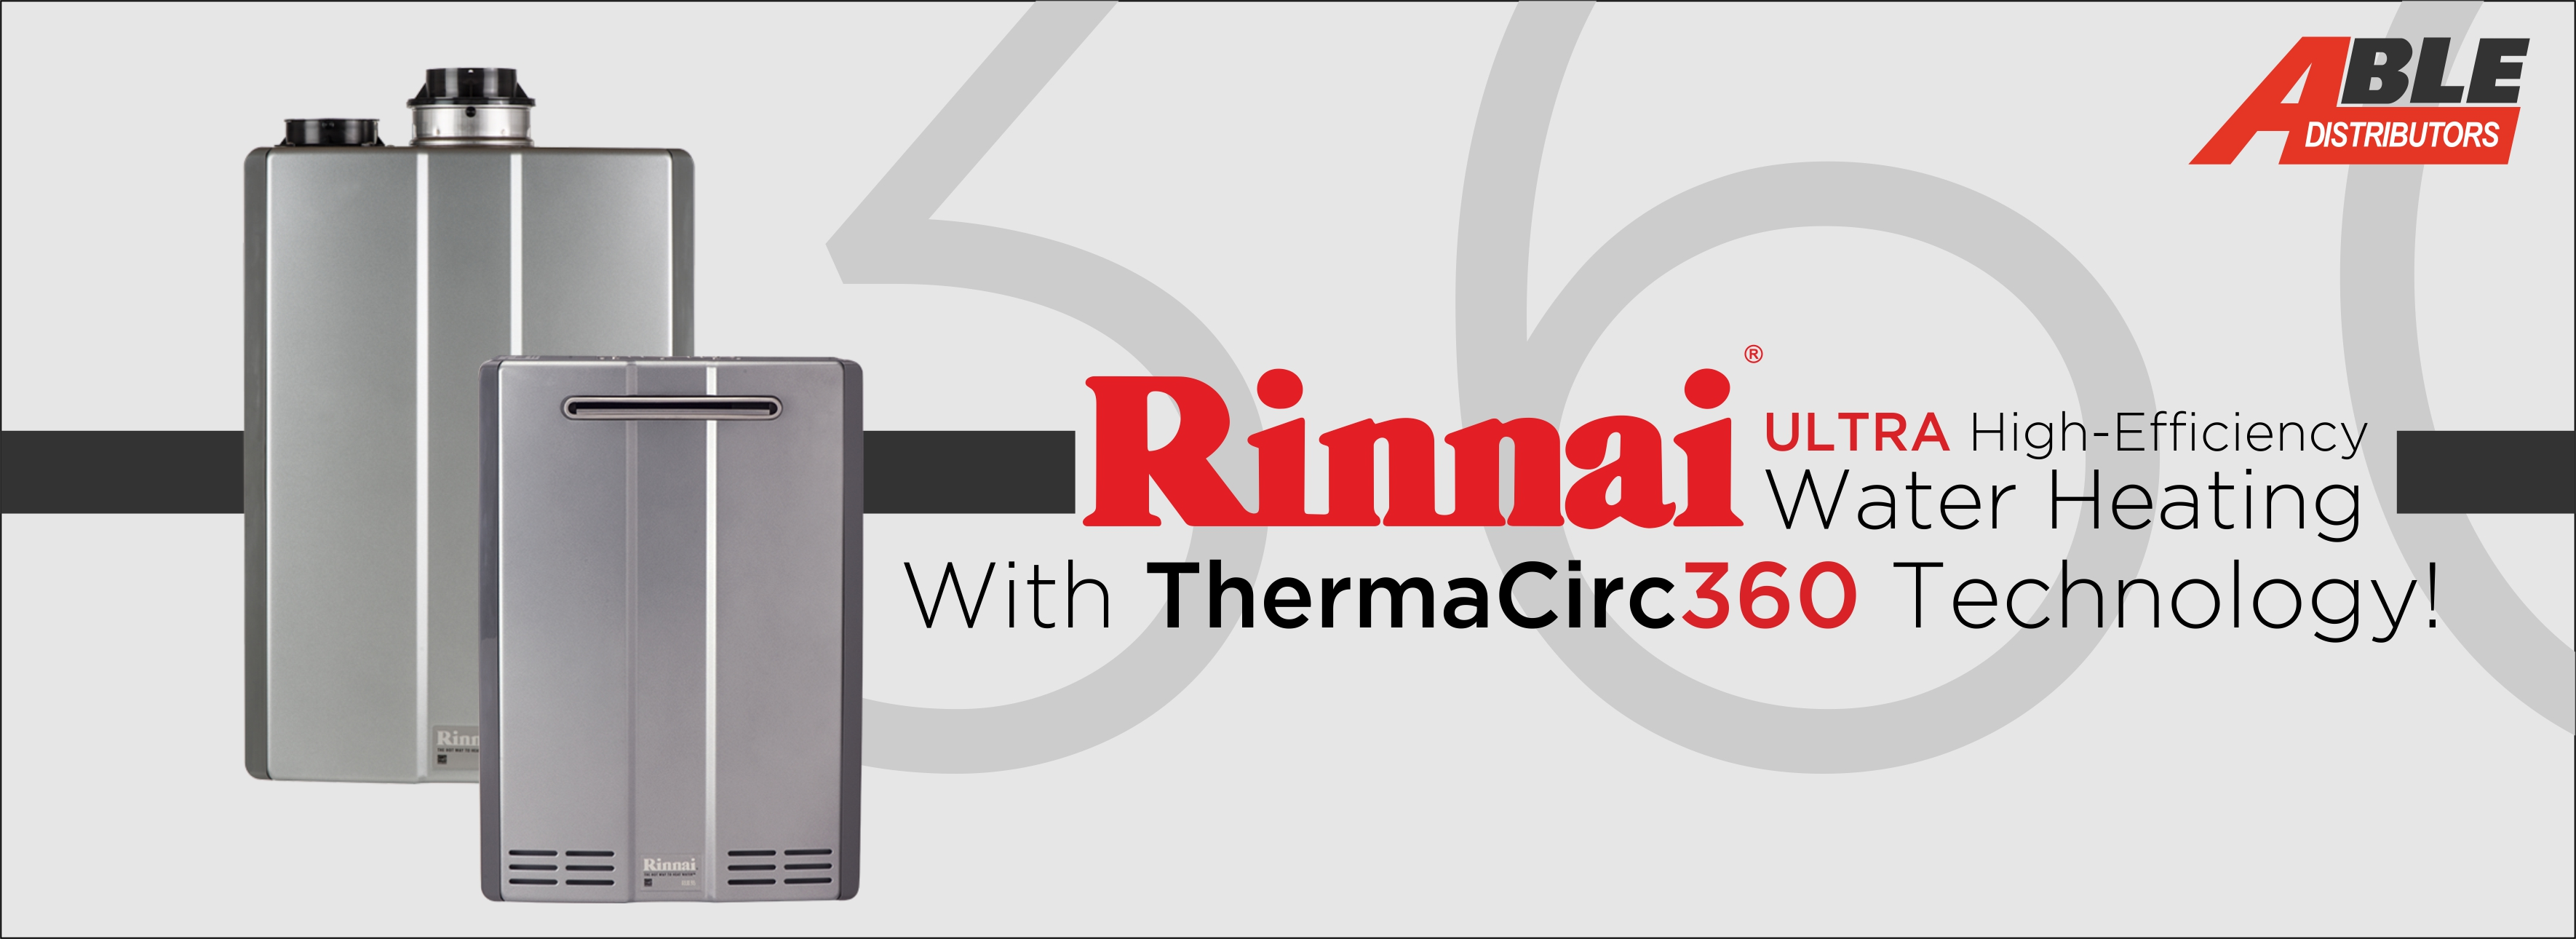 Rinnai Makes Recirculation Easy Able Distributors